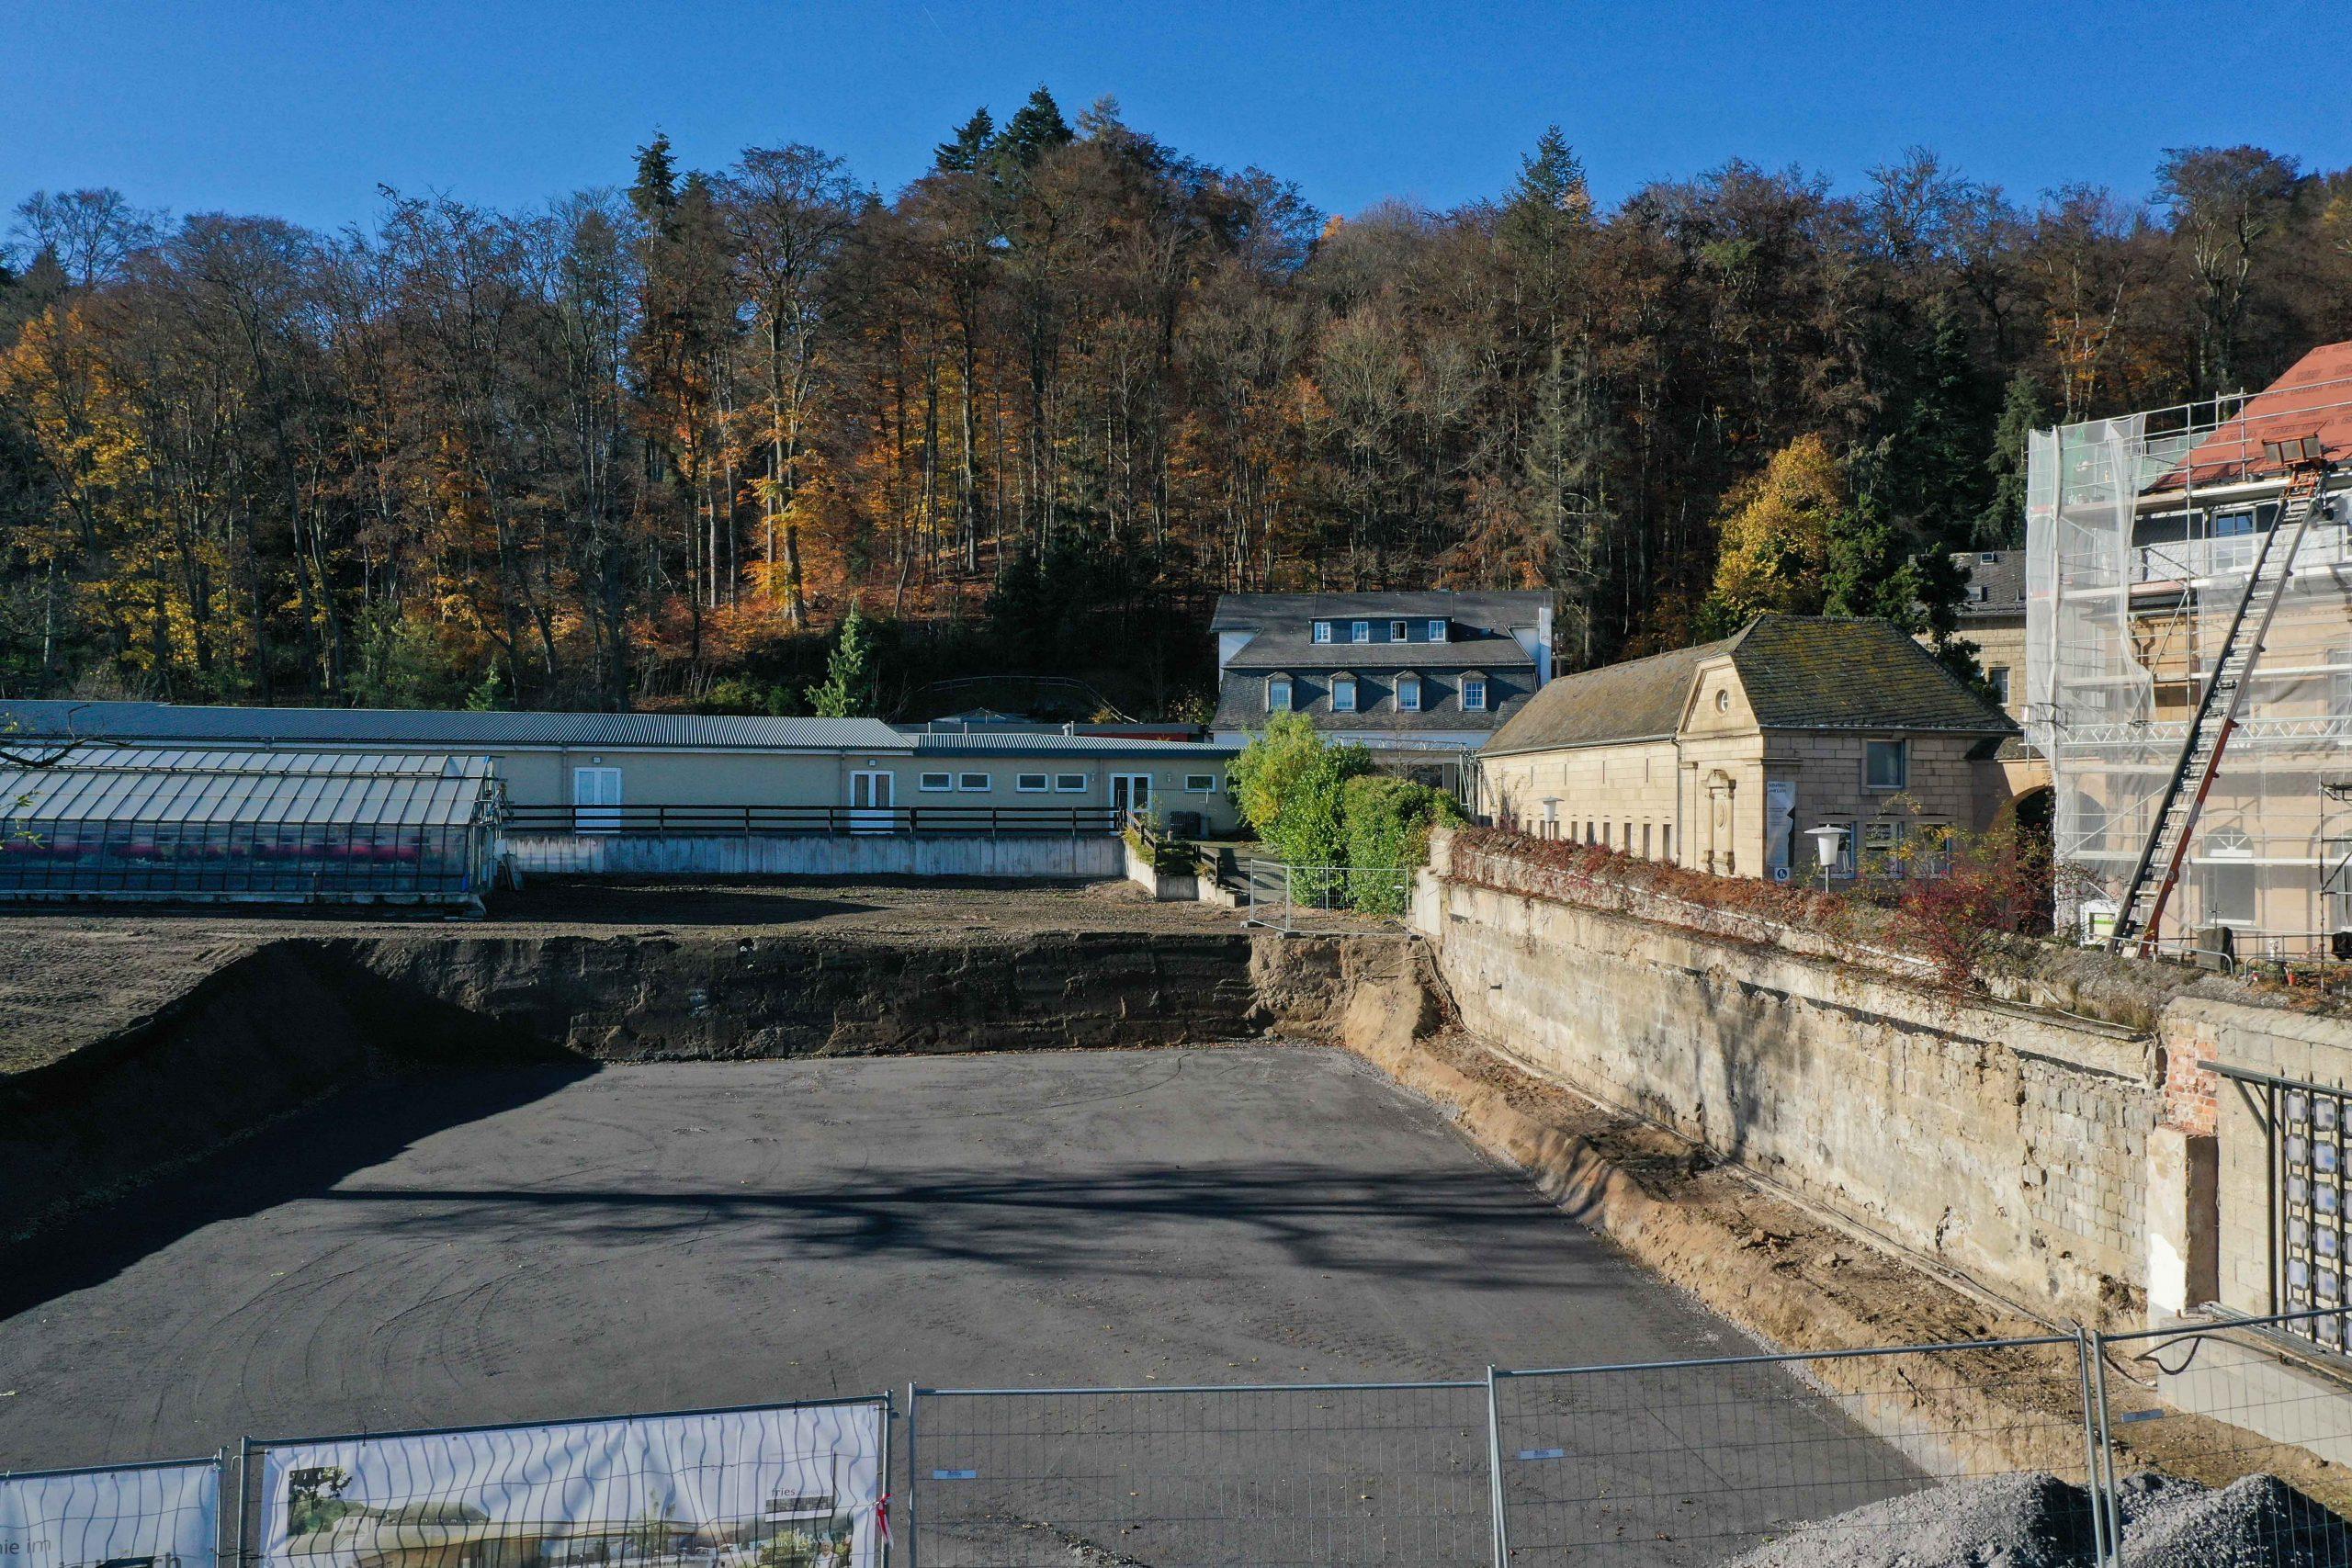 KfW-Förderung Wiesbaden, Energieberatung Wiesbaden